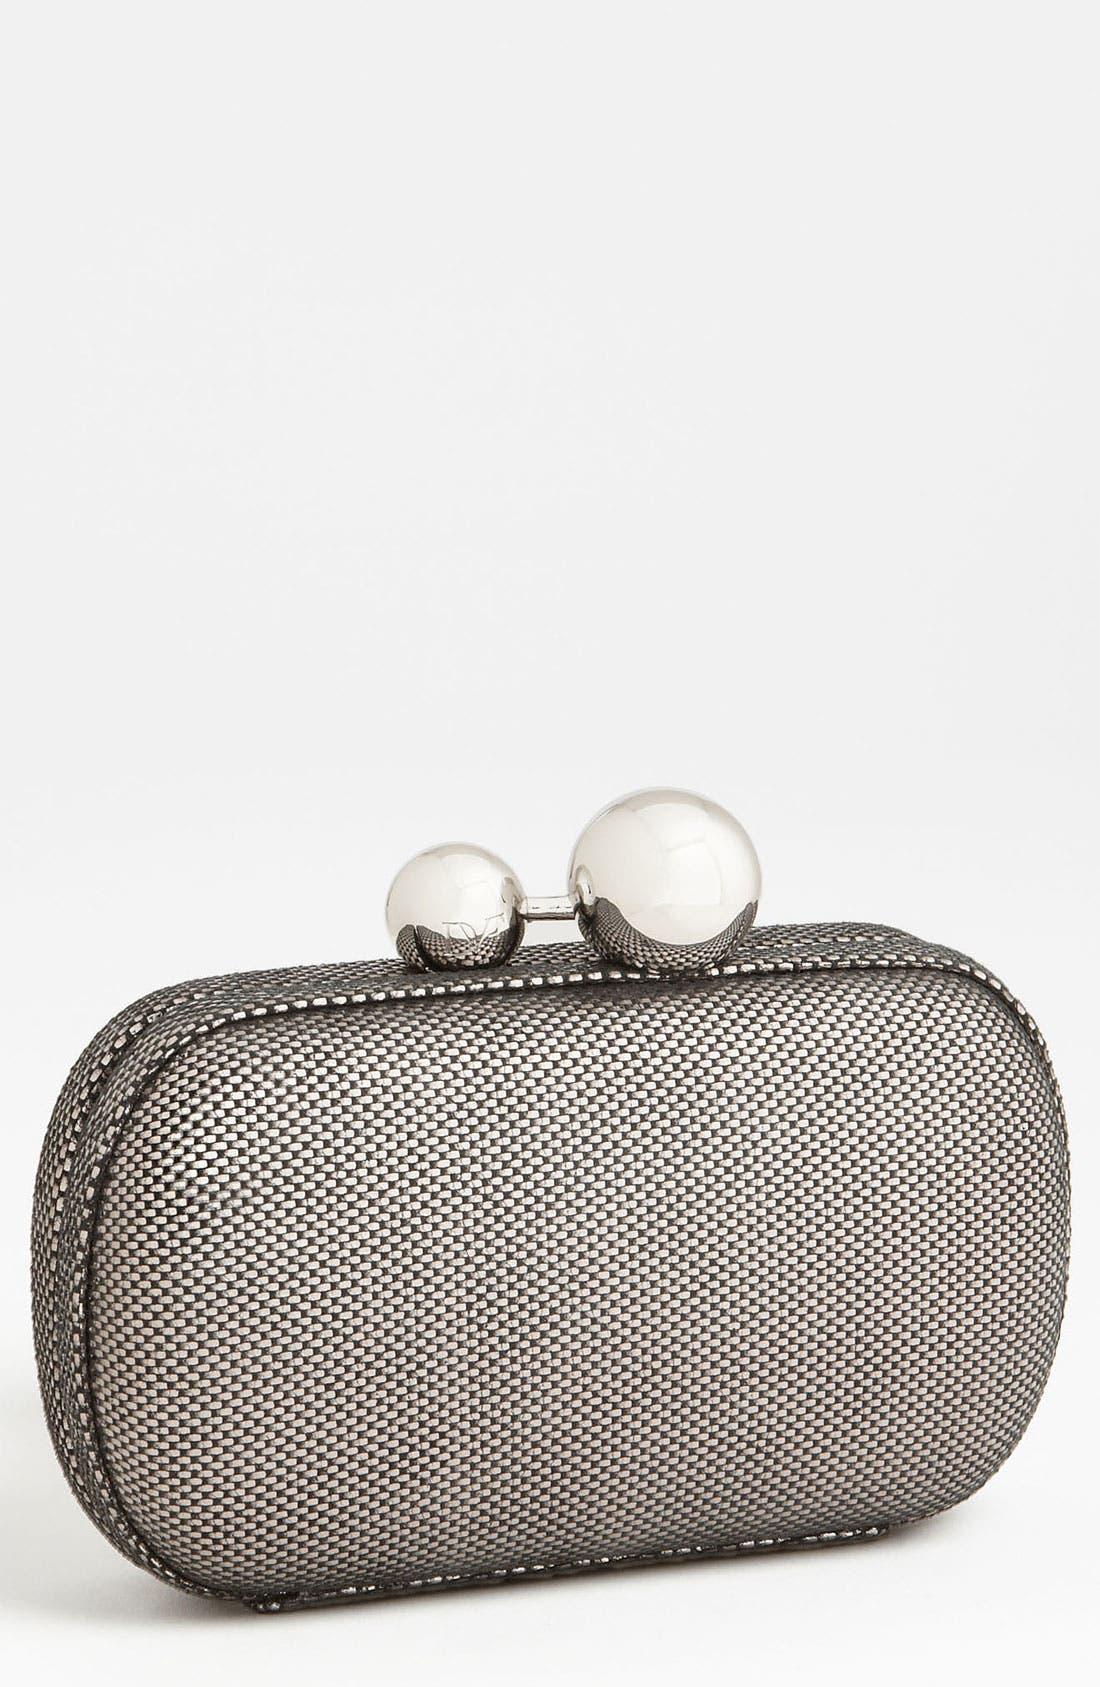 Main Image - Diane von Furstenberg Metallic Tweed Leather Minaudiere